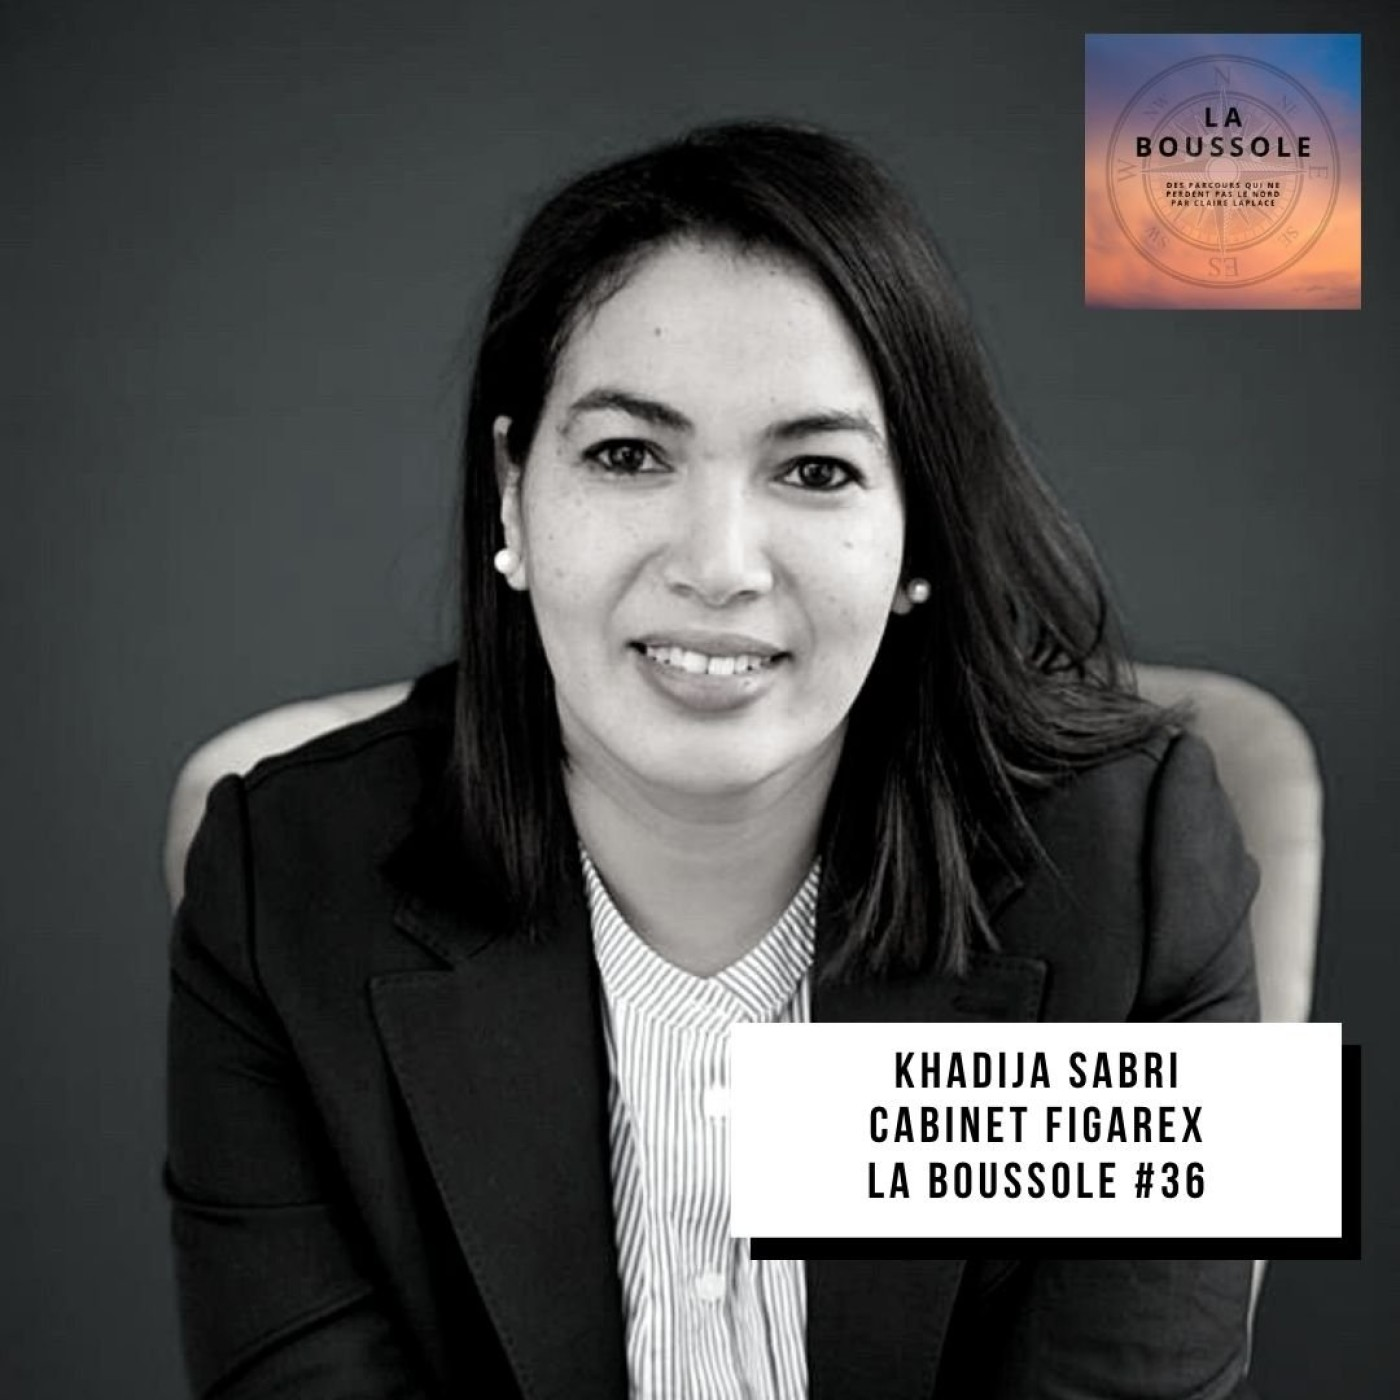 #36_Khadija Sabri_Figarex Conseils et Expertises, oser rêver en grand